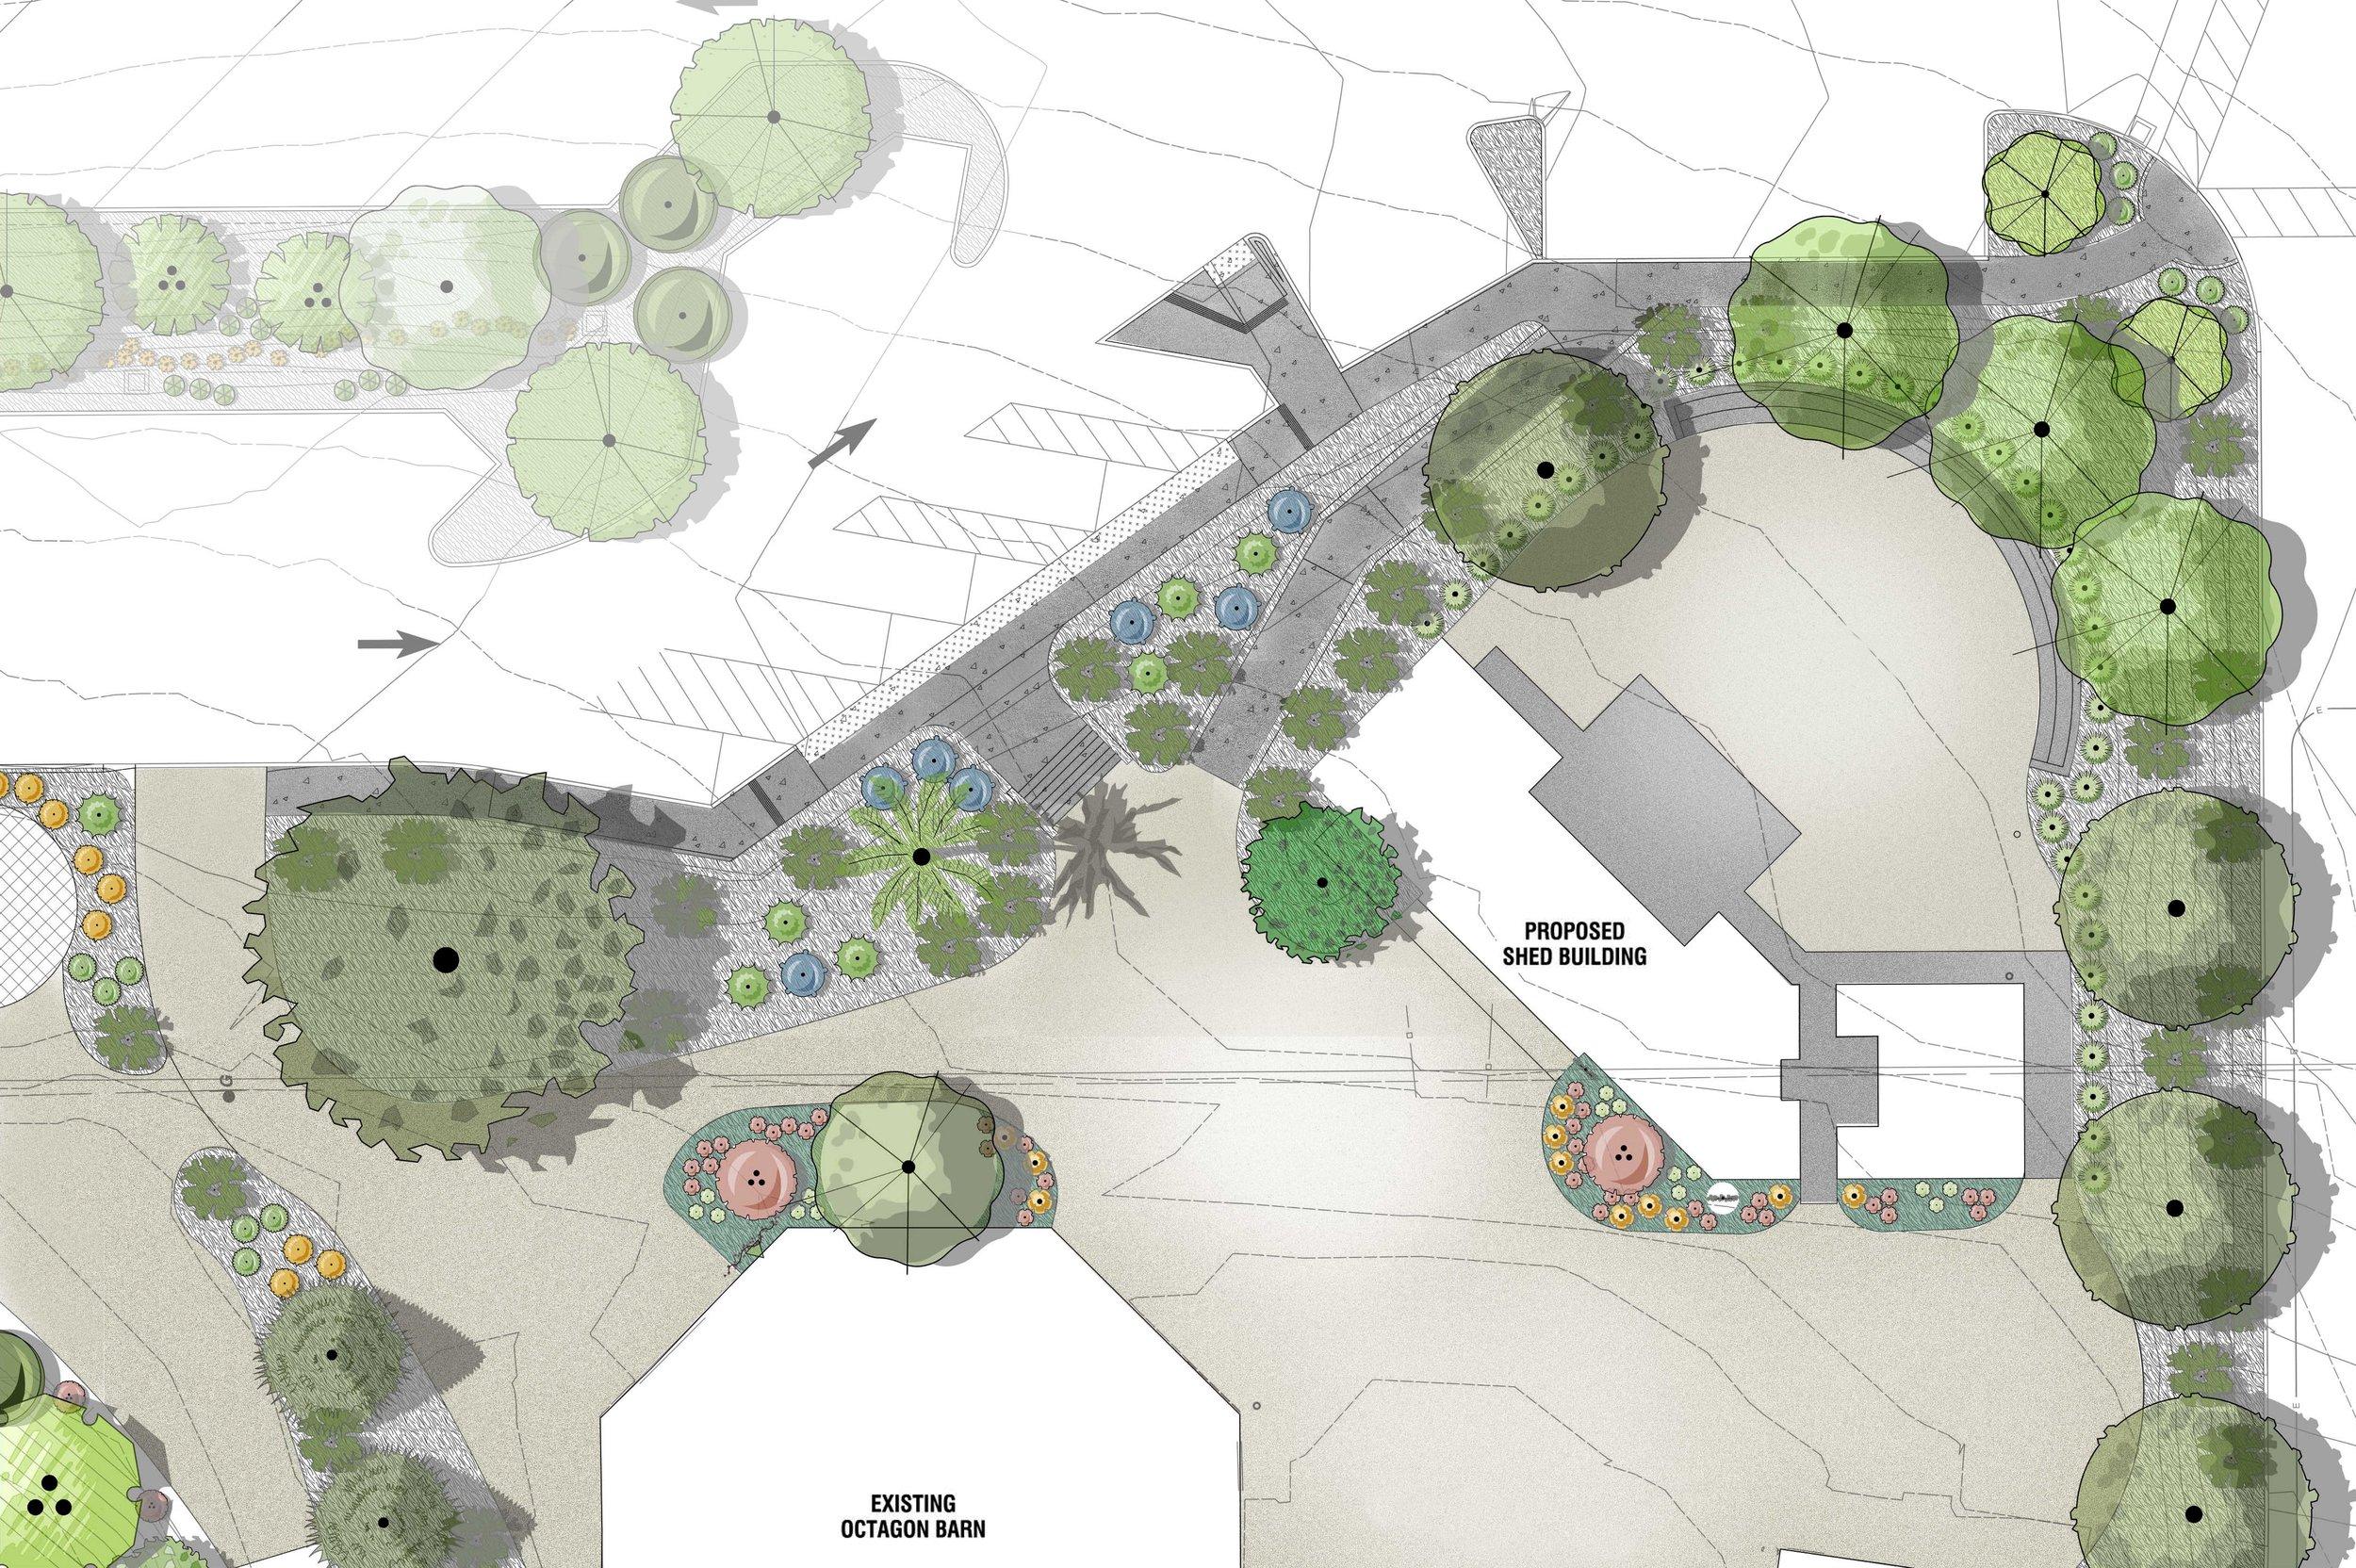 Octagon Barn San Luis Obispo Landscape Architecture Ten Over Studio.jpg